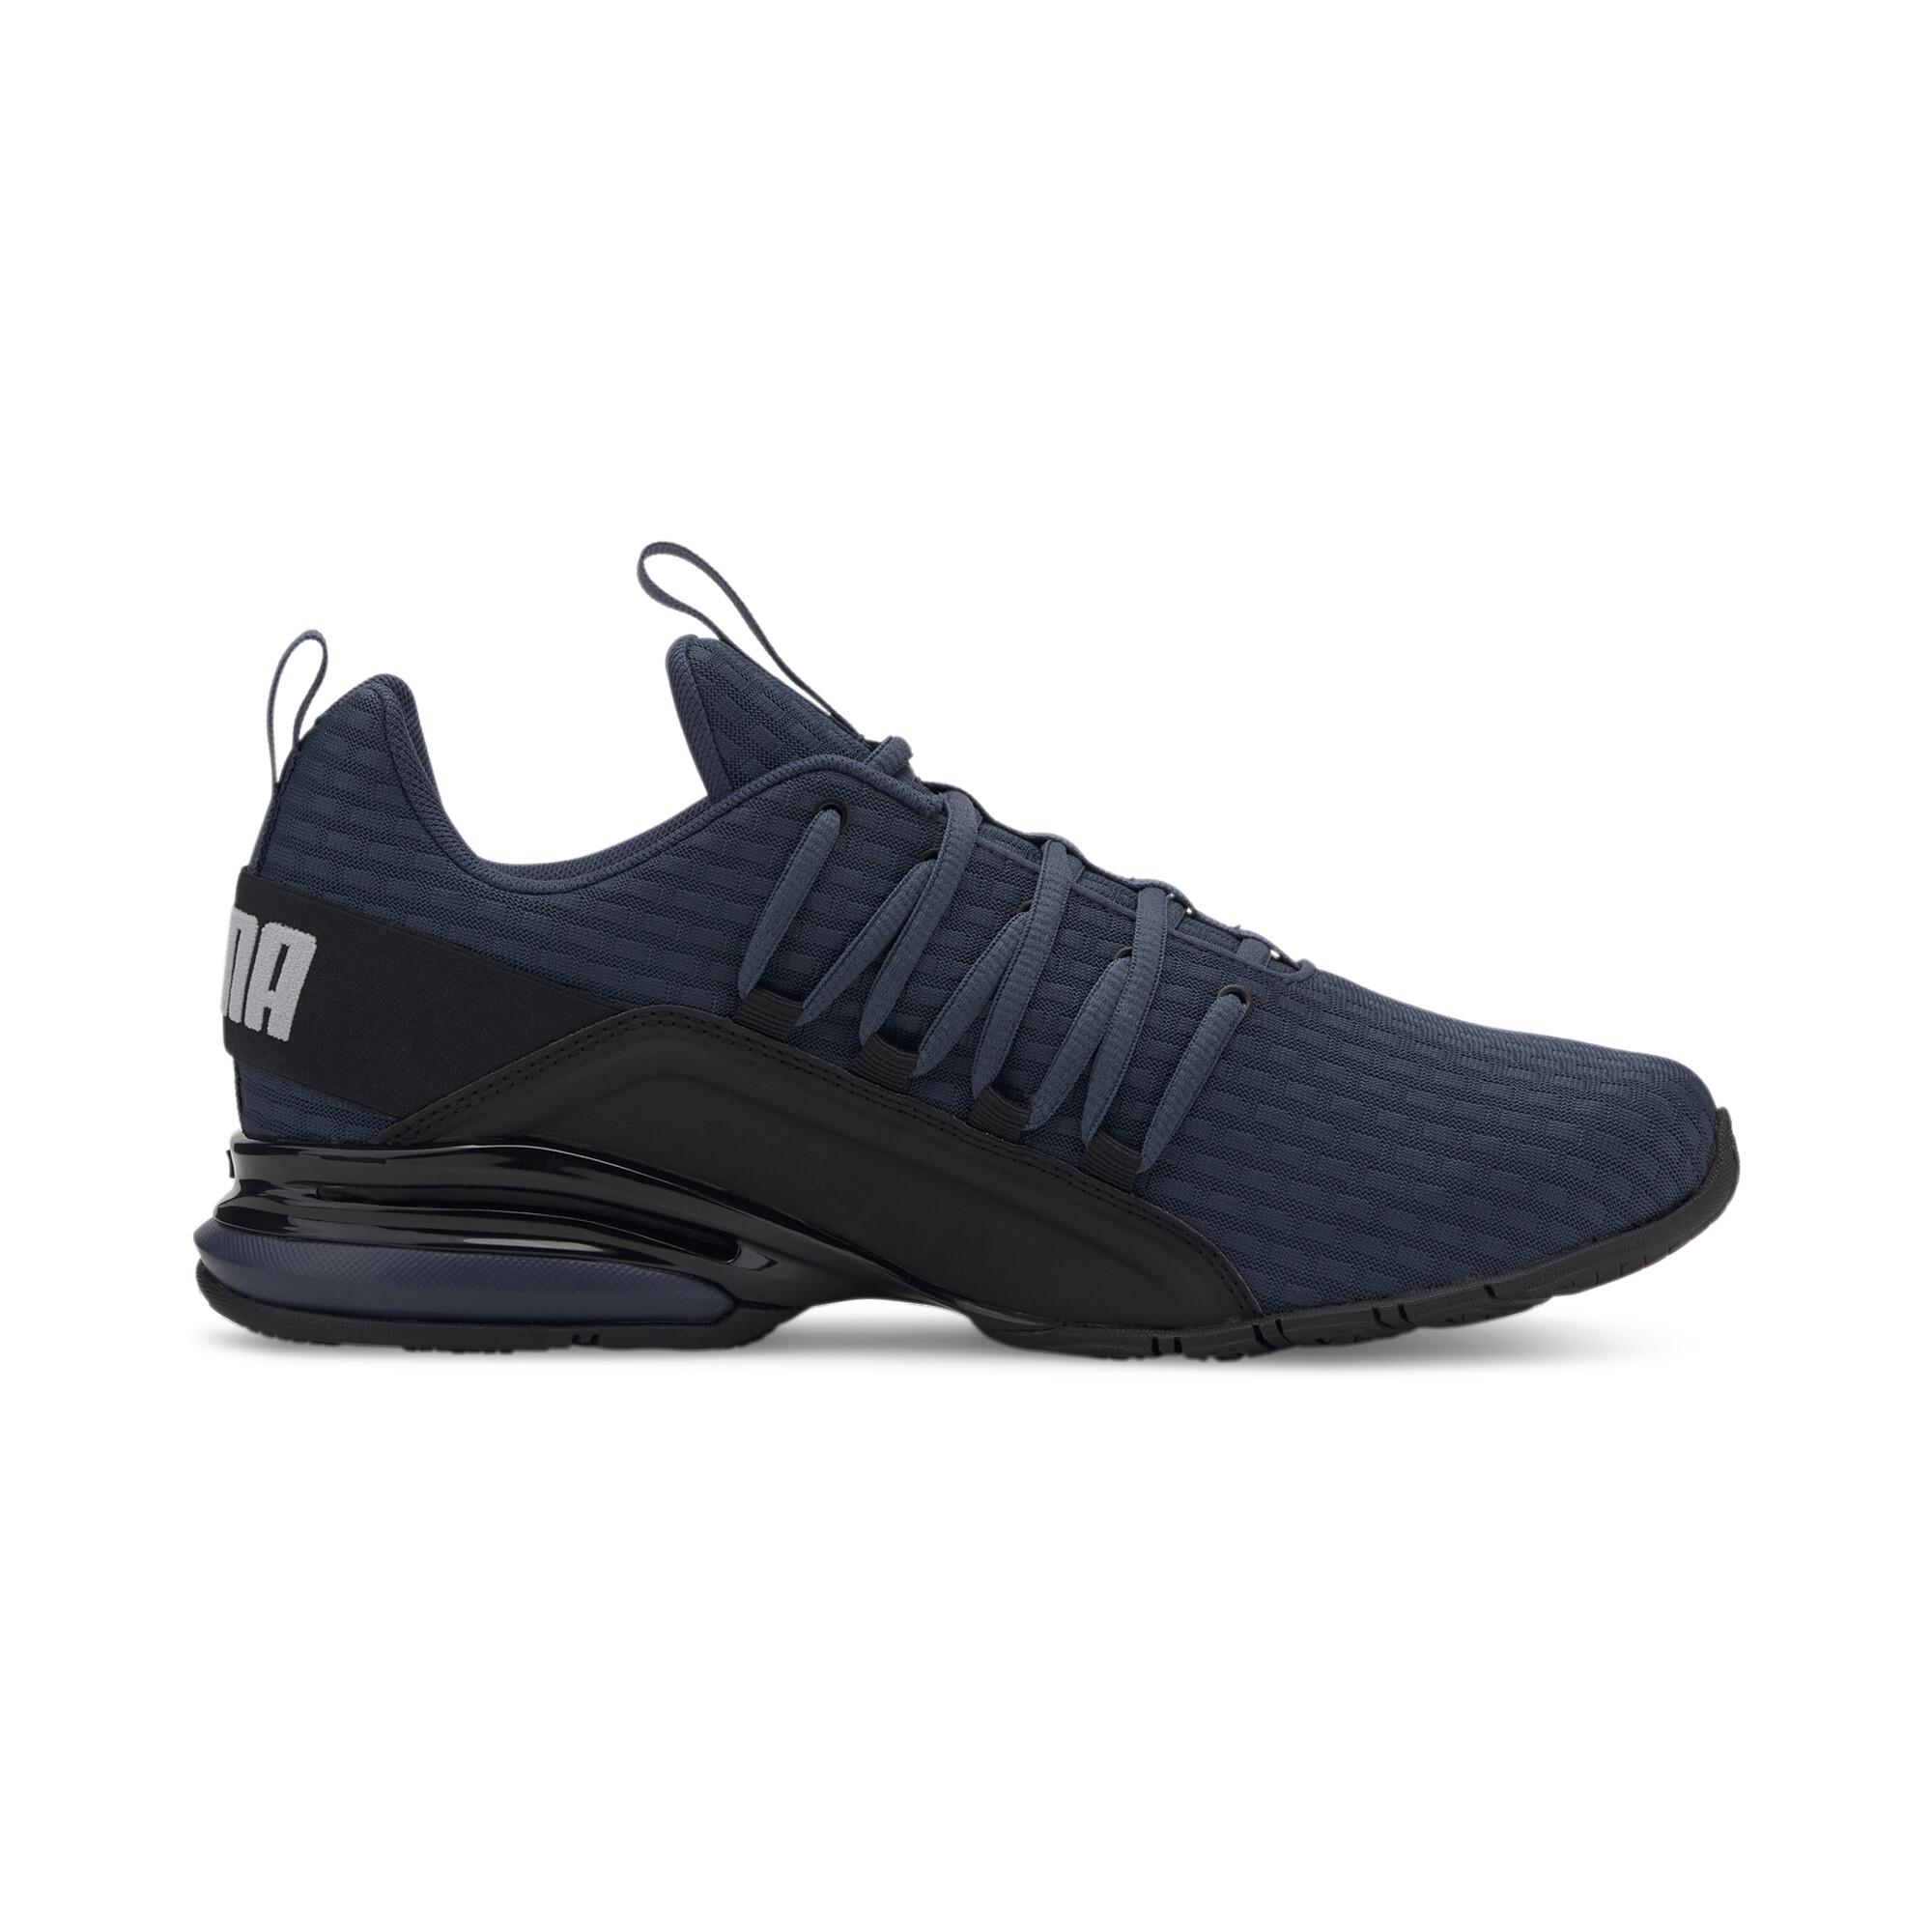 PUMA-Men-039-s-Axelion-Block-Running-Shoes thumbnail 7